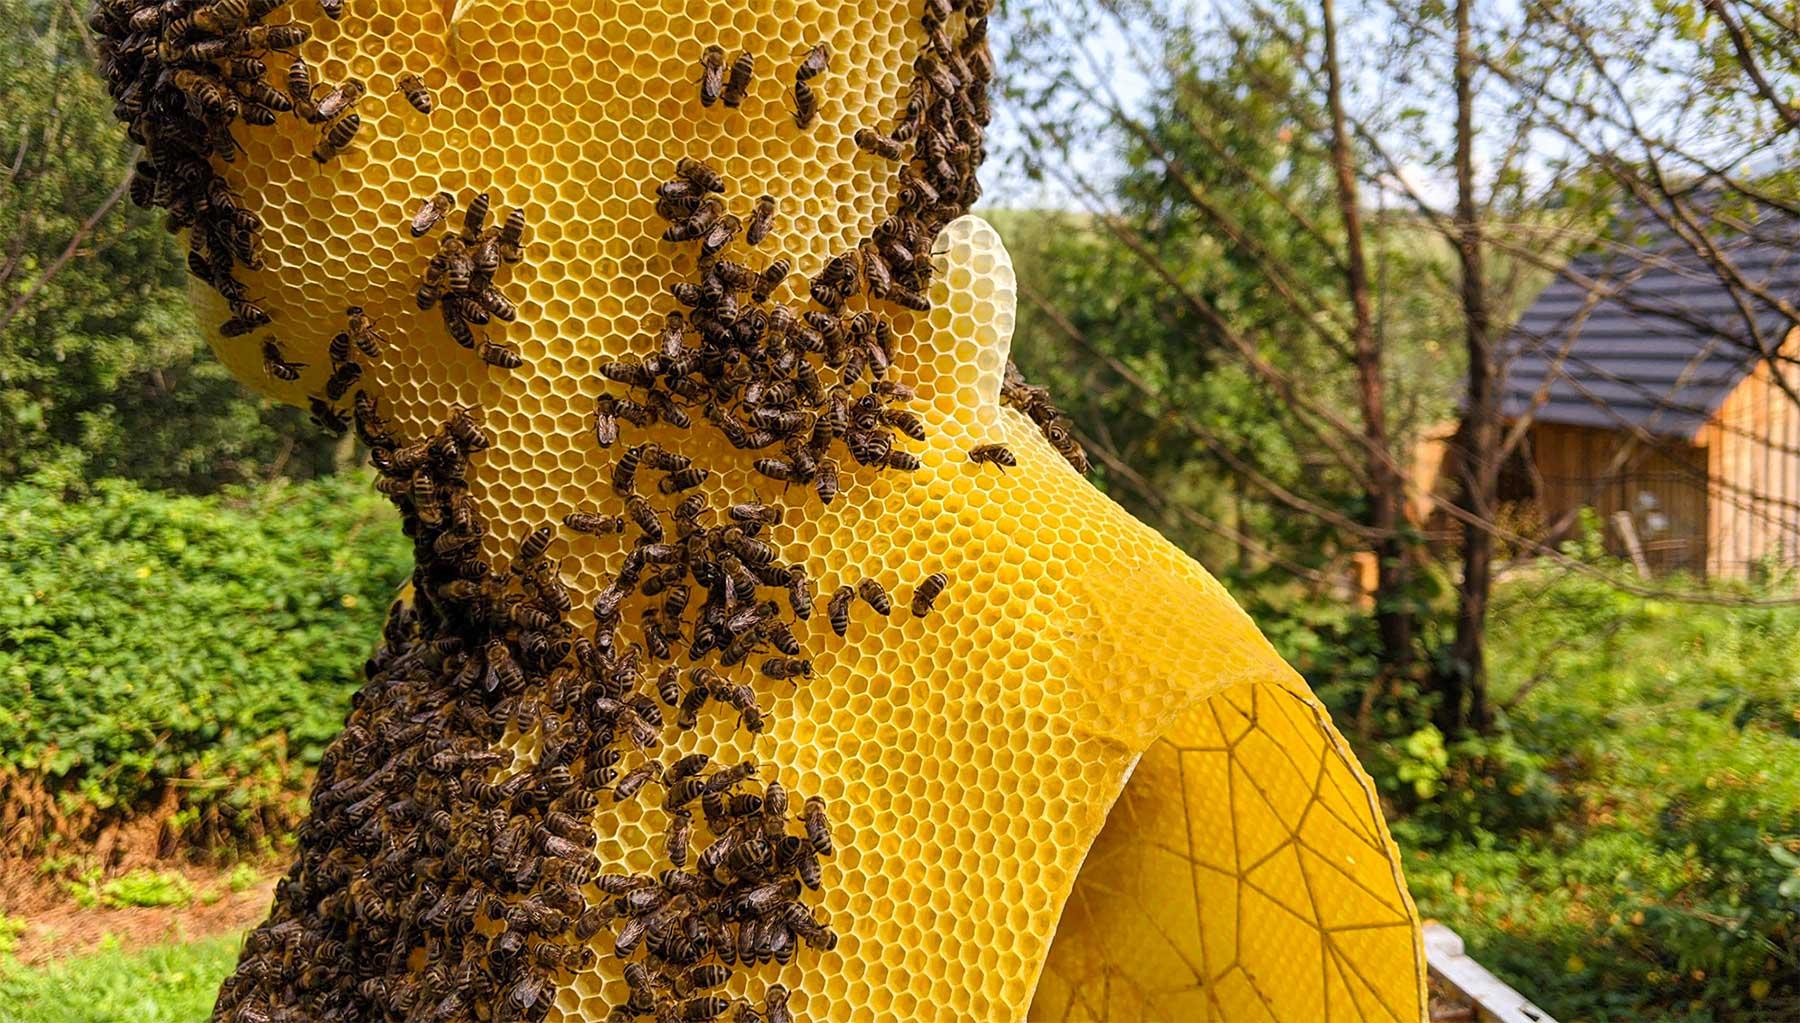 Bienenwachs-Skulpturen von Tomáš Libertíny Tomas-Libertiny-Bienenwachs-skulpturen_02